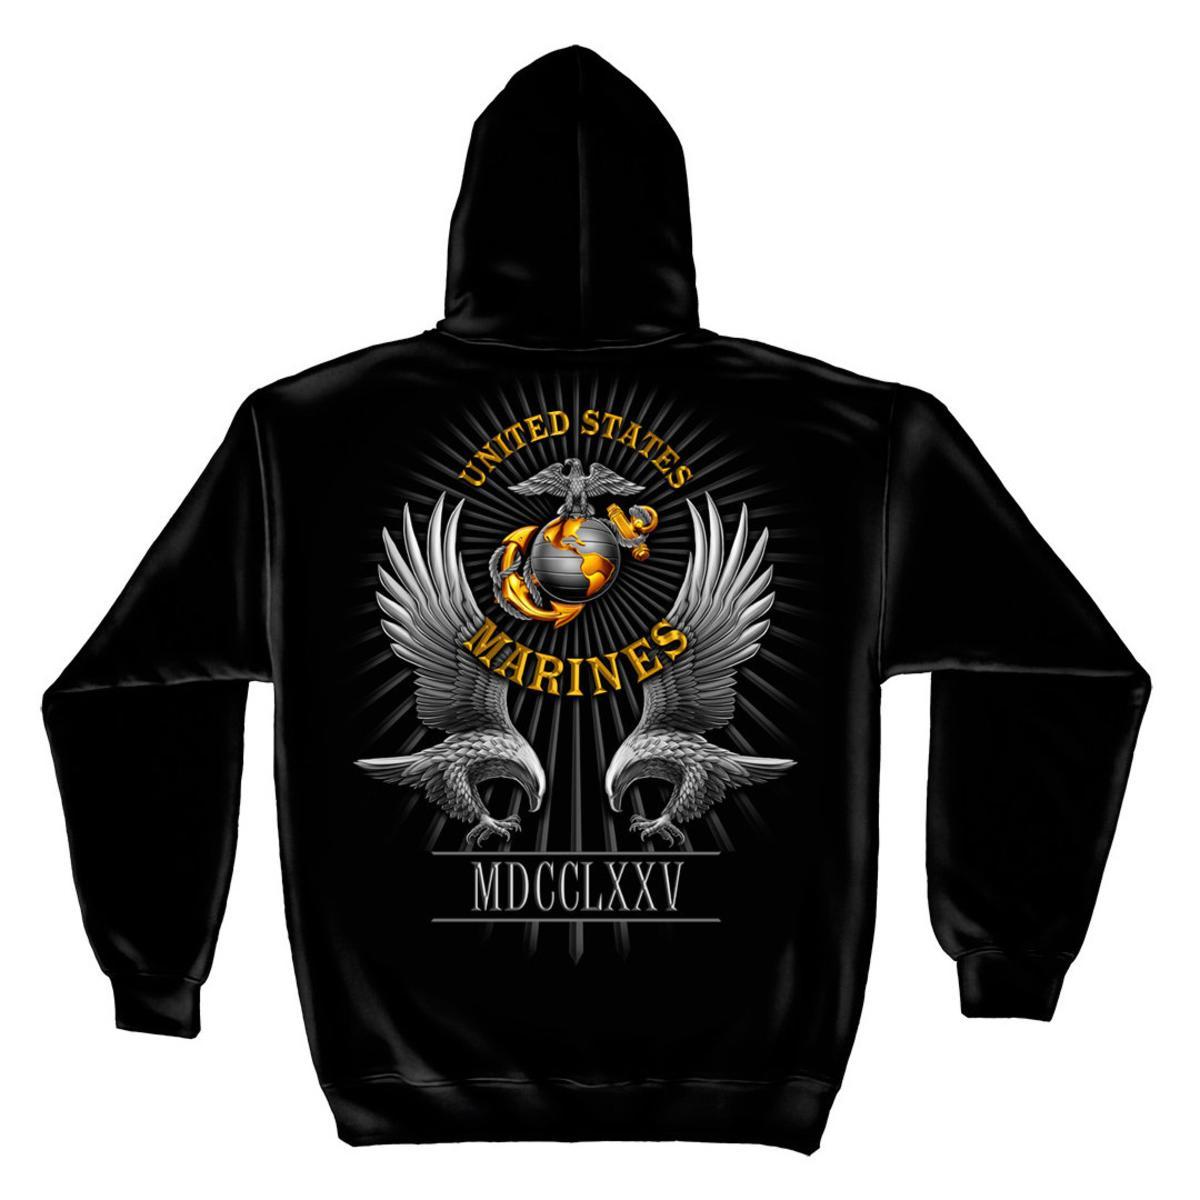 USMC Marine Corps Founded Date 1775 Military Sweatshirt by Erazor Bits, Black